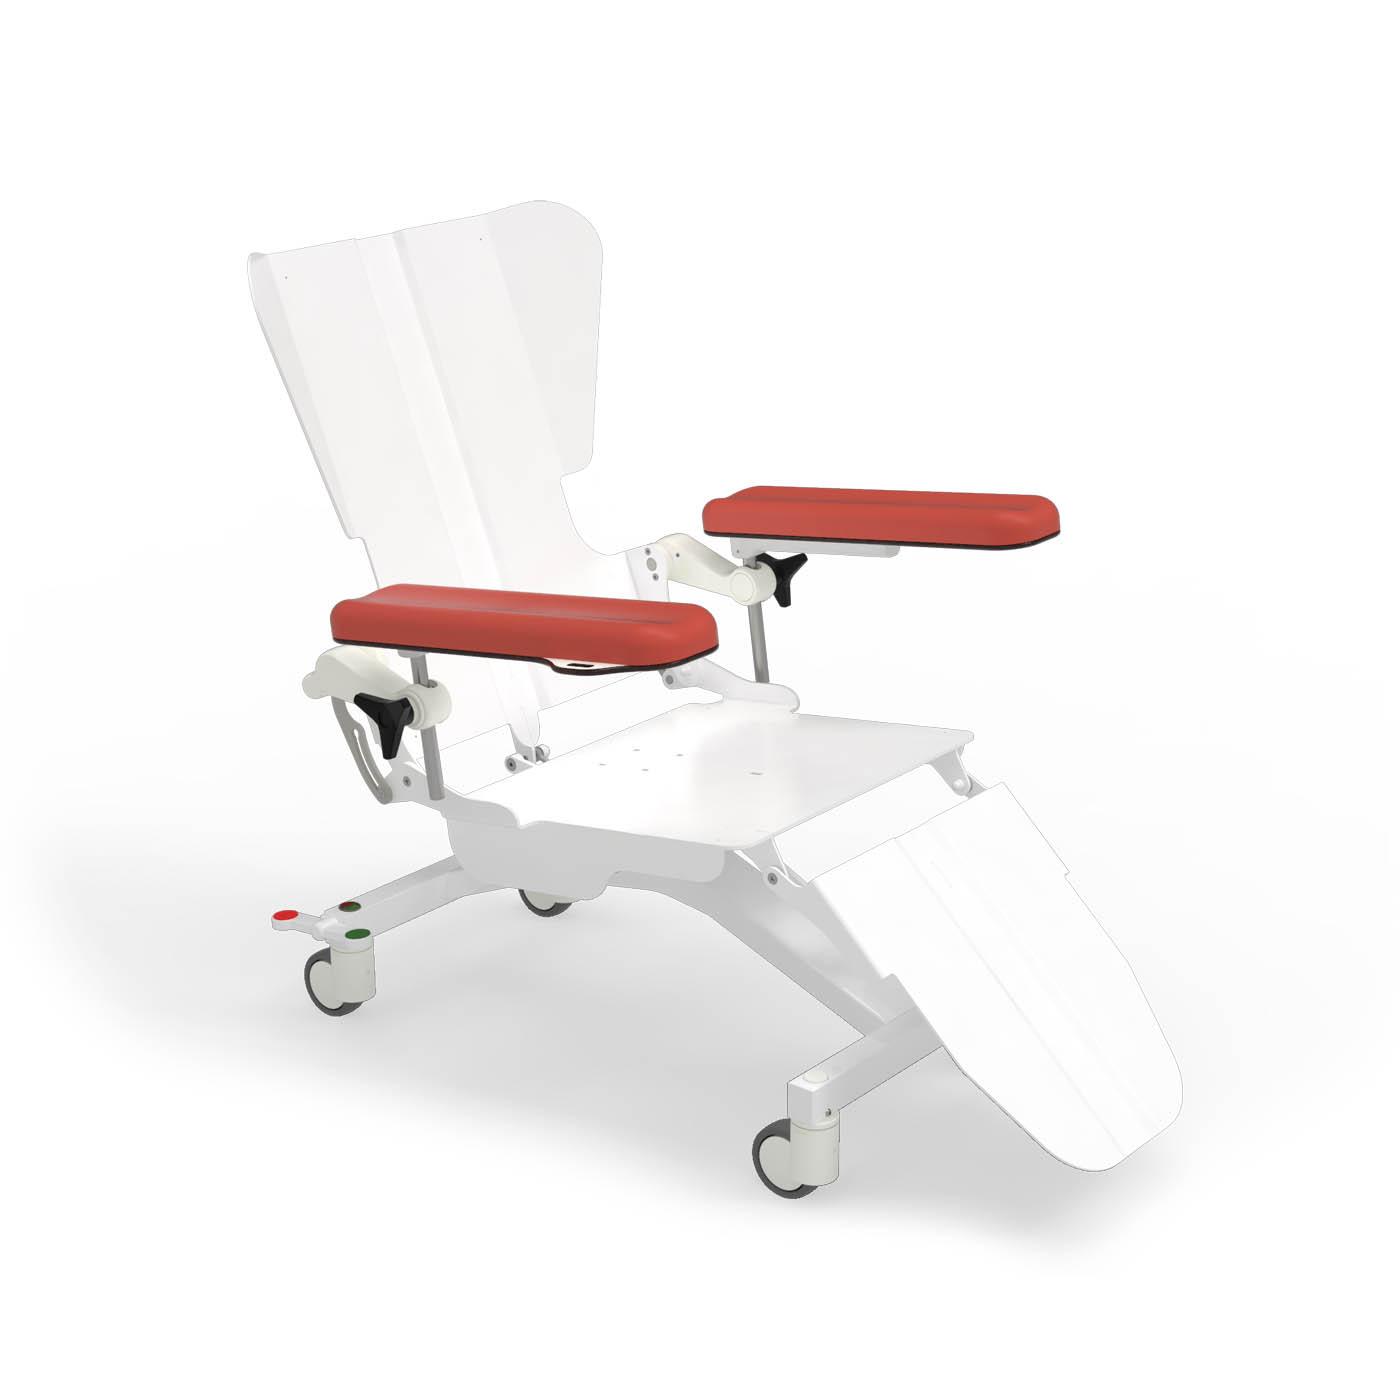 Gardhen Bilance - Poltrone Hospital - Eco 2.0